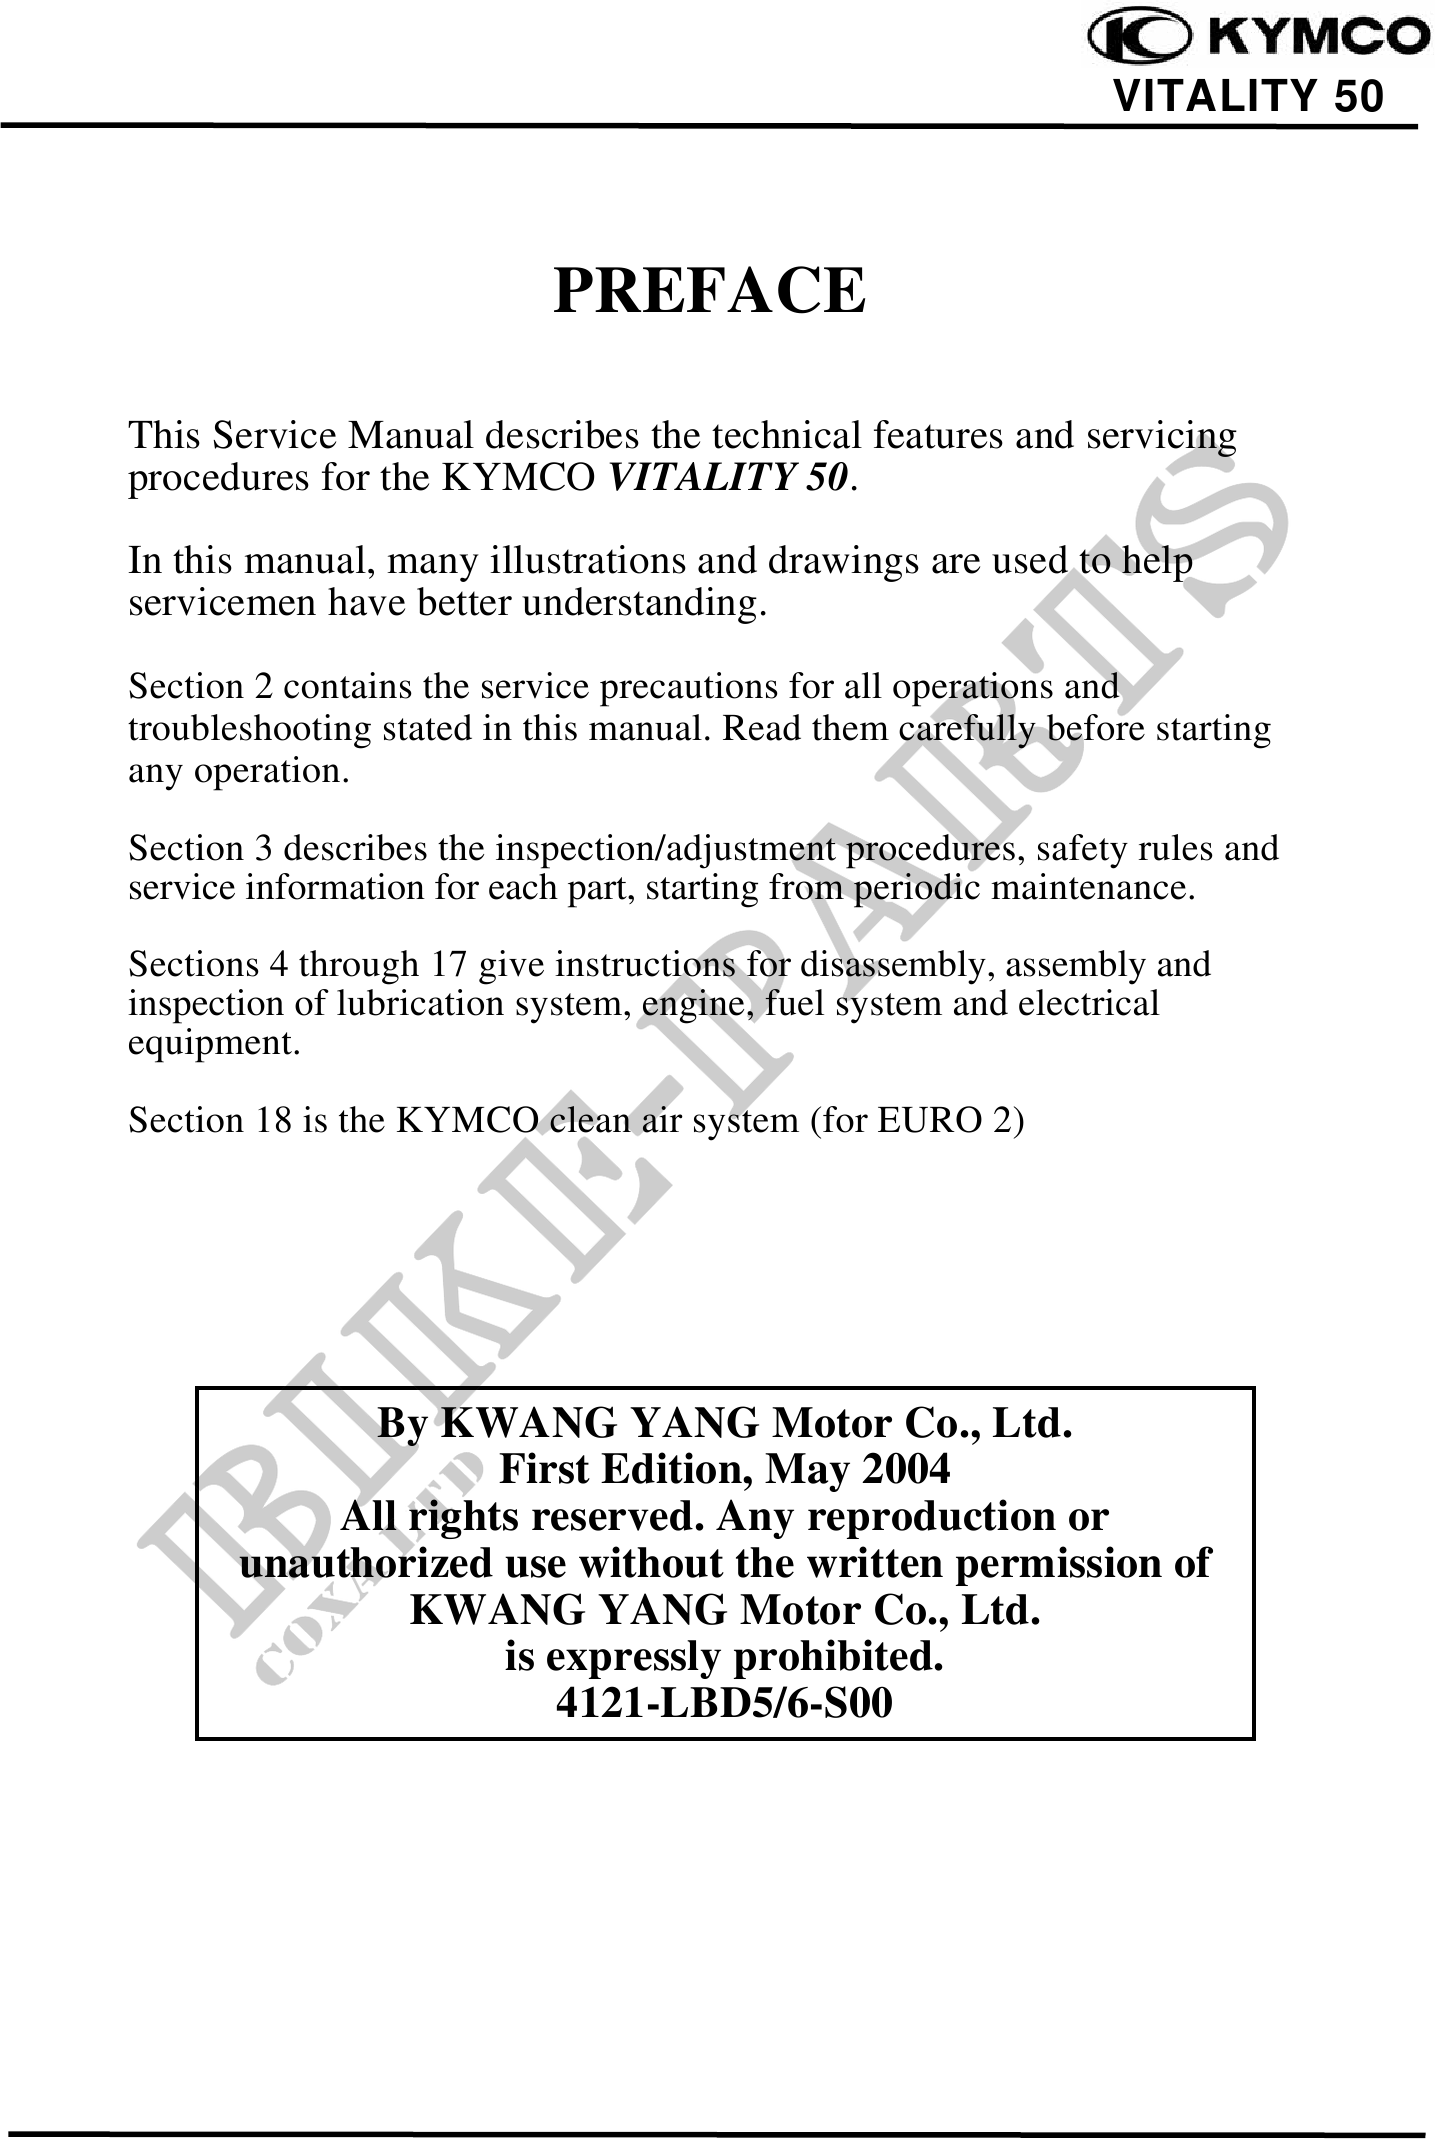 kymco vitality 50 2t service manual